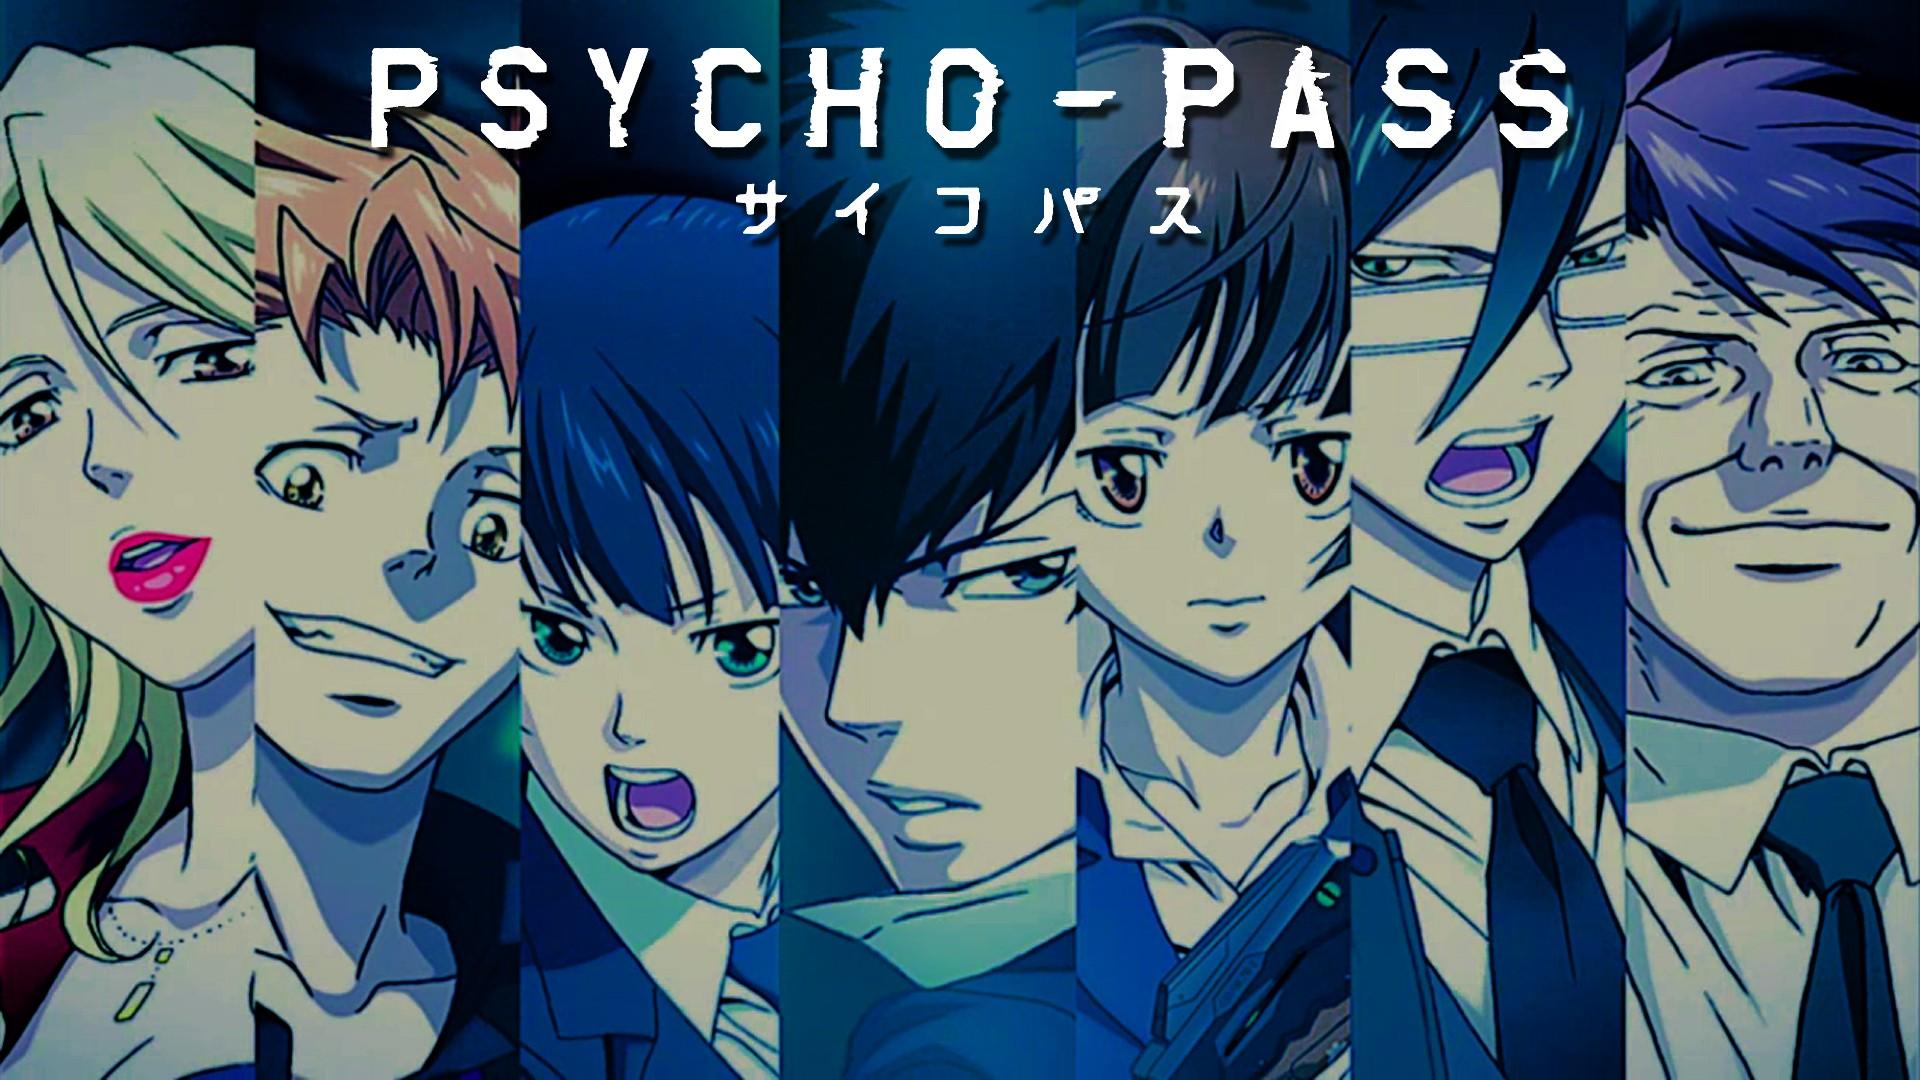 Psycho Pass Computer Wallpapers Desktop Backgrounds 1920x1080 ID 1920x1080